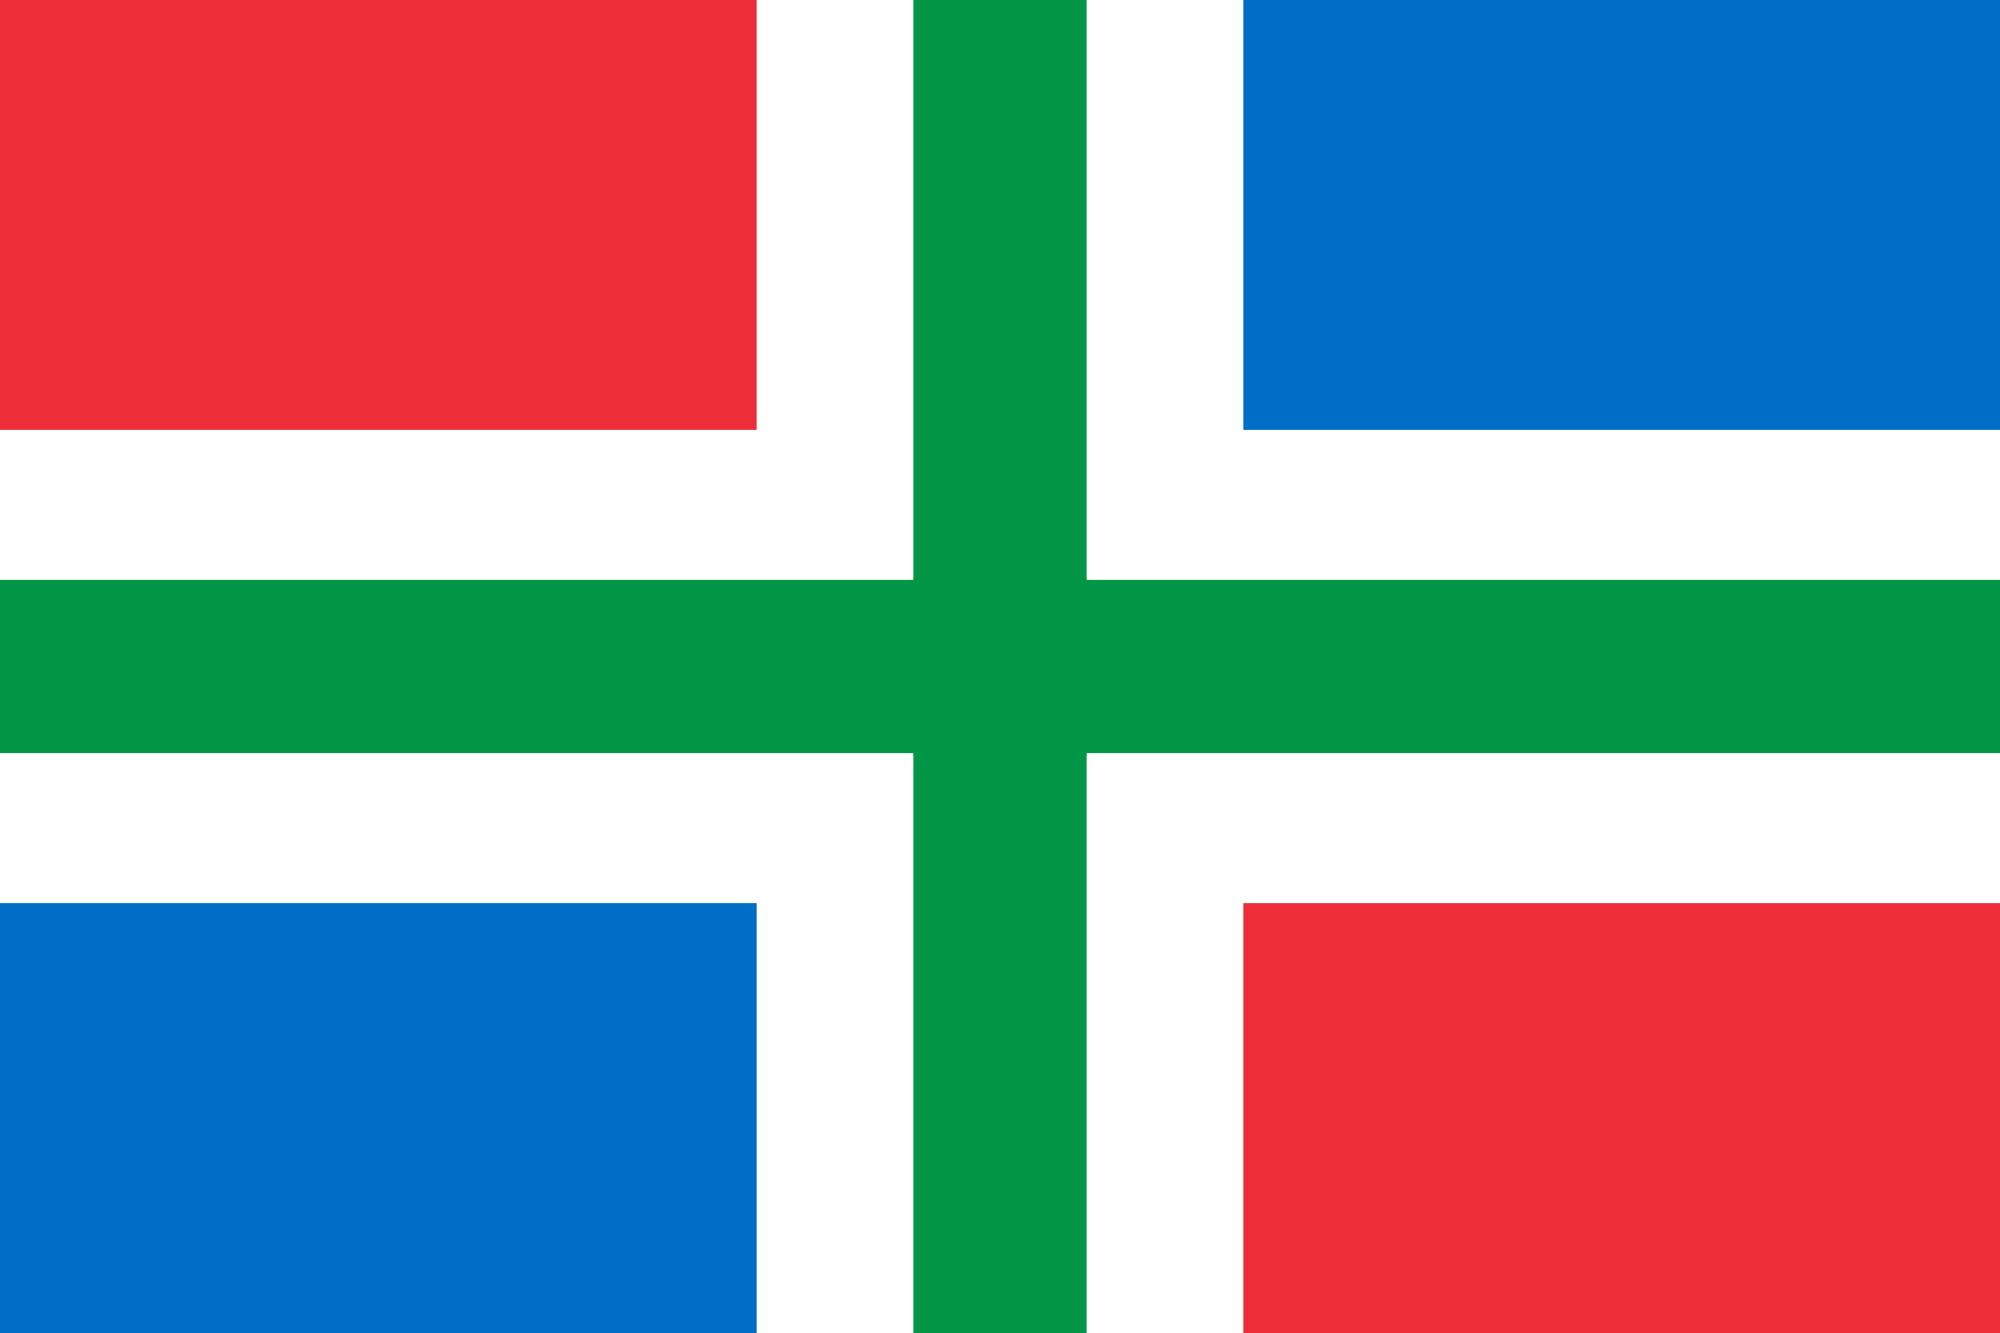 Groningen (Province)